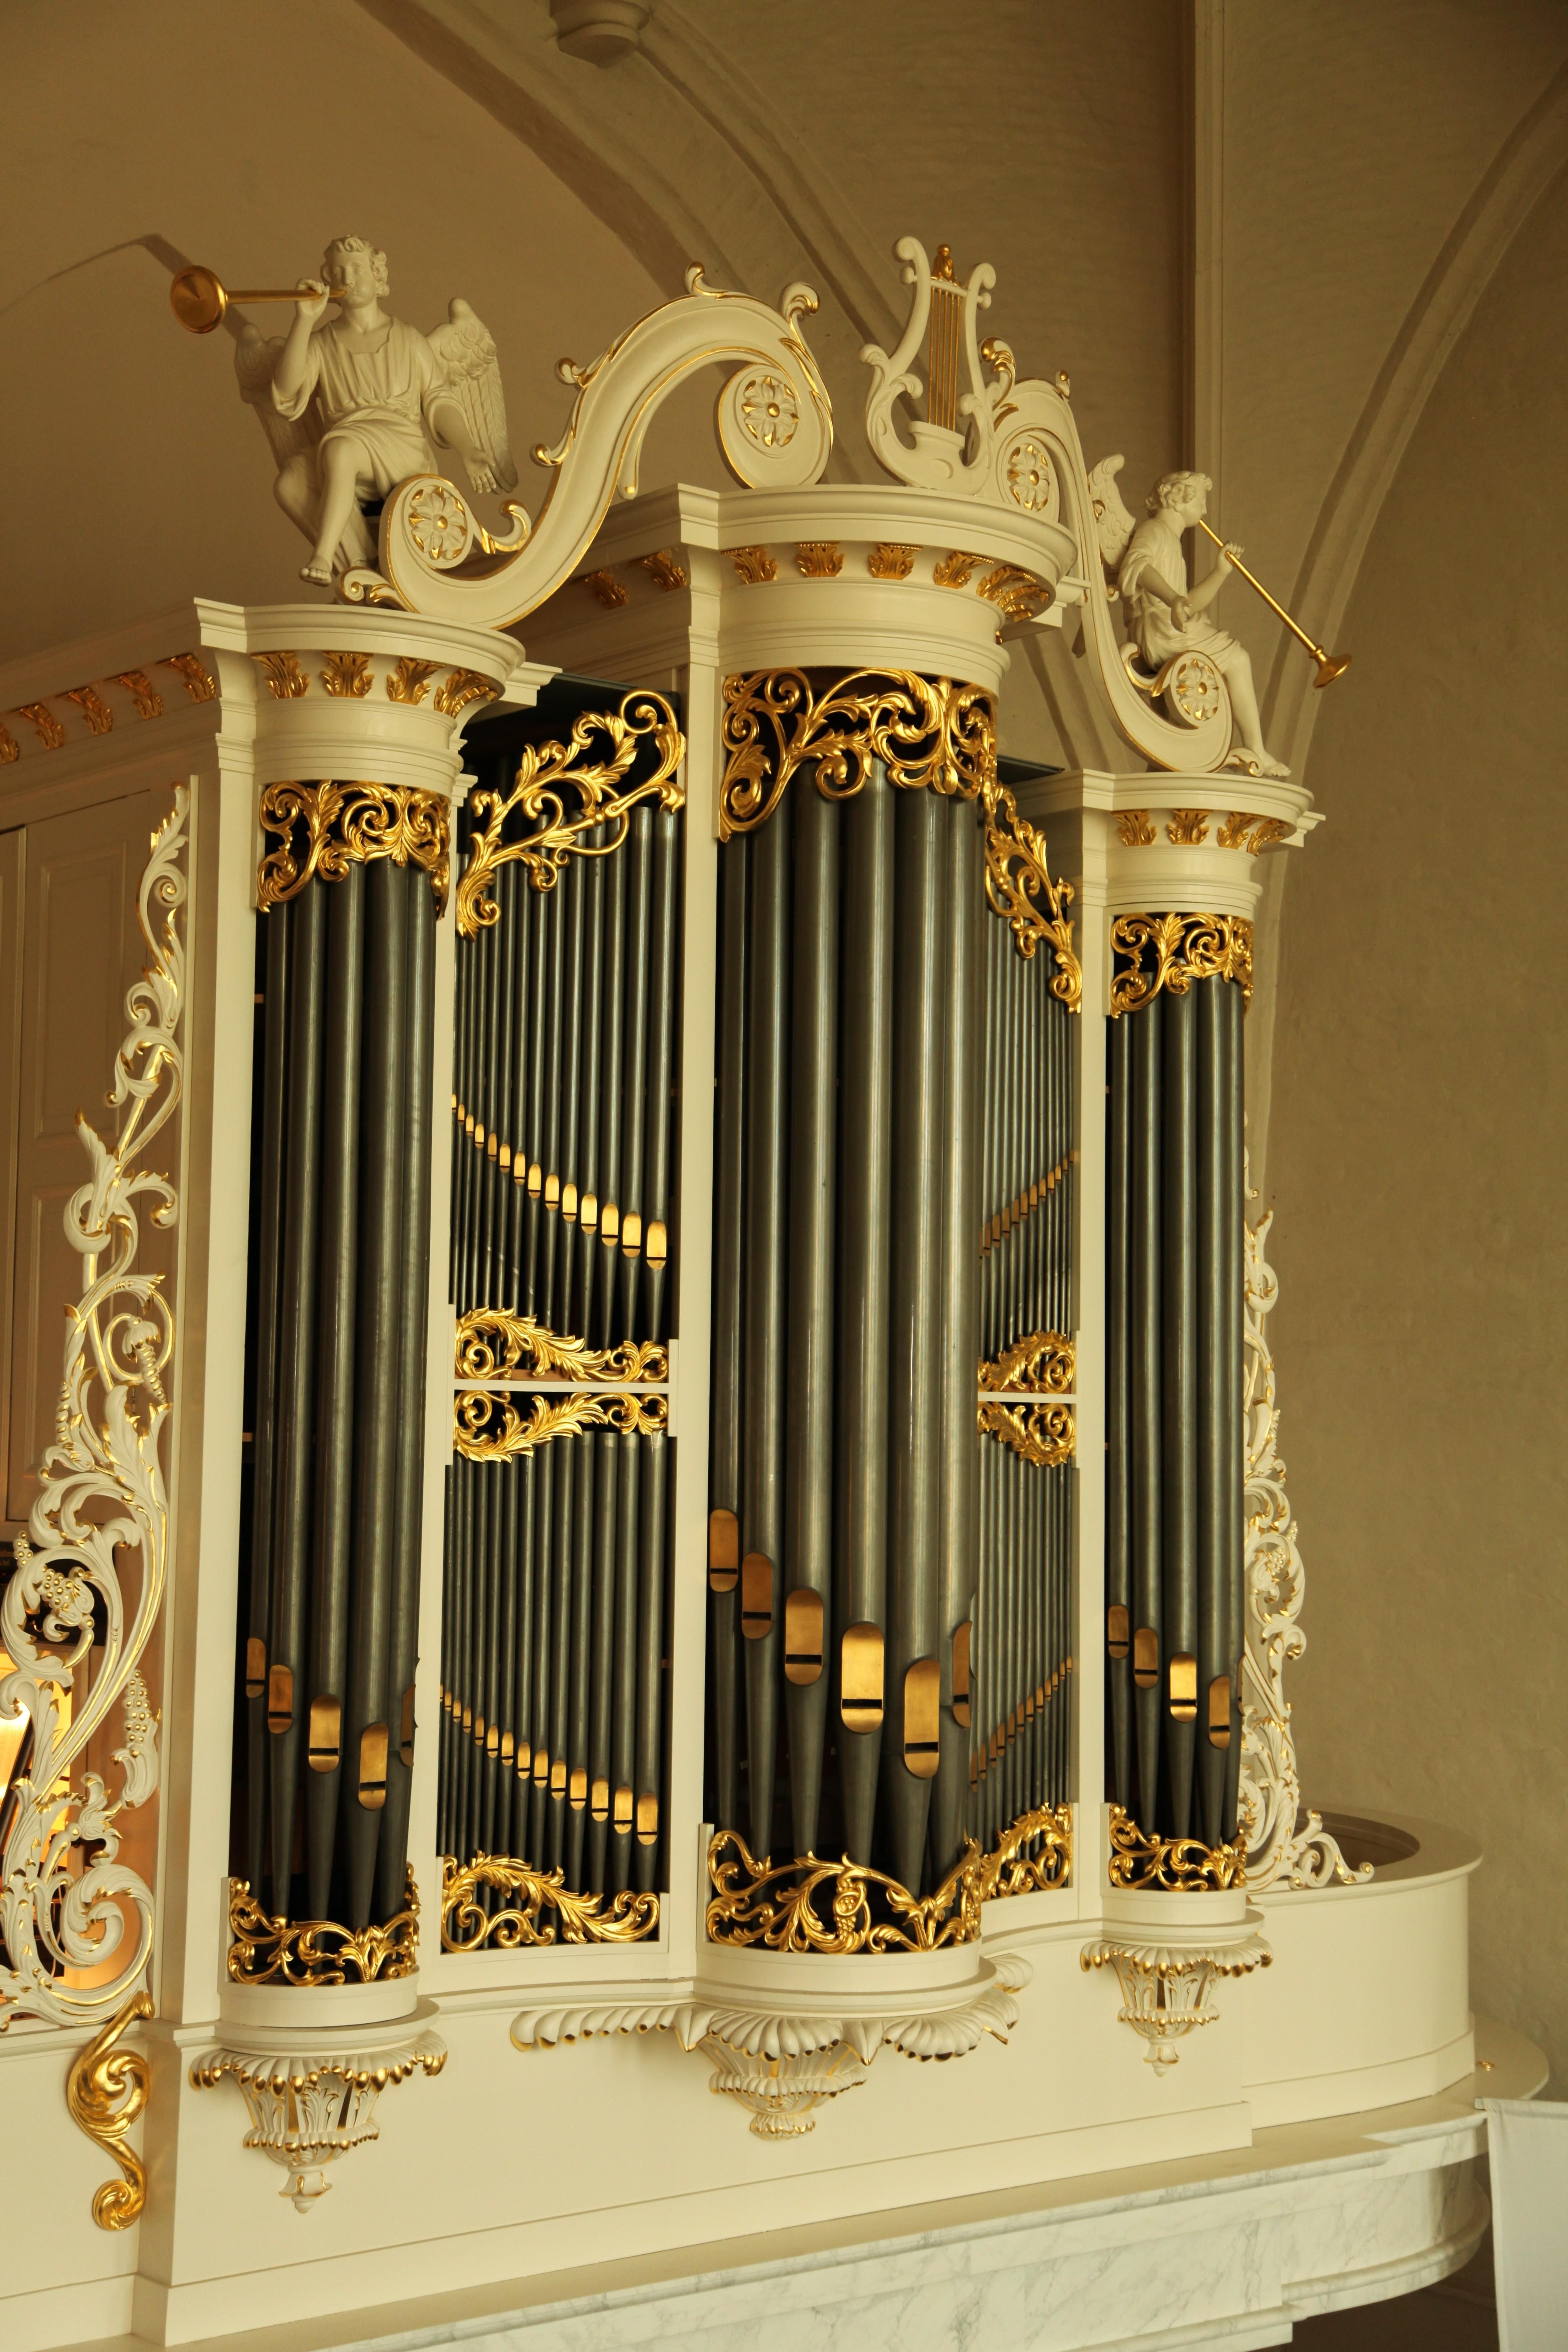 Het Carl Friedrich August Naber-orgel uit 1853 in de Hervormde Kerk te Wilp.